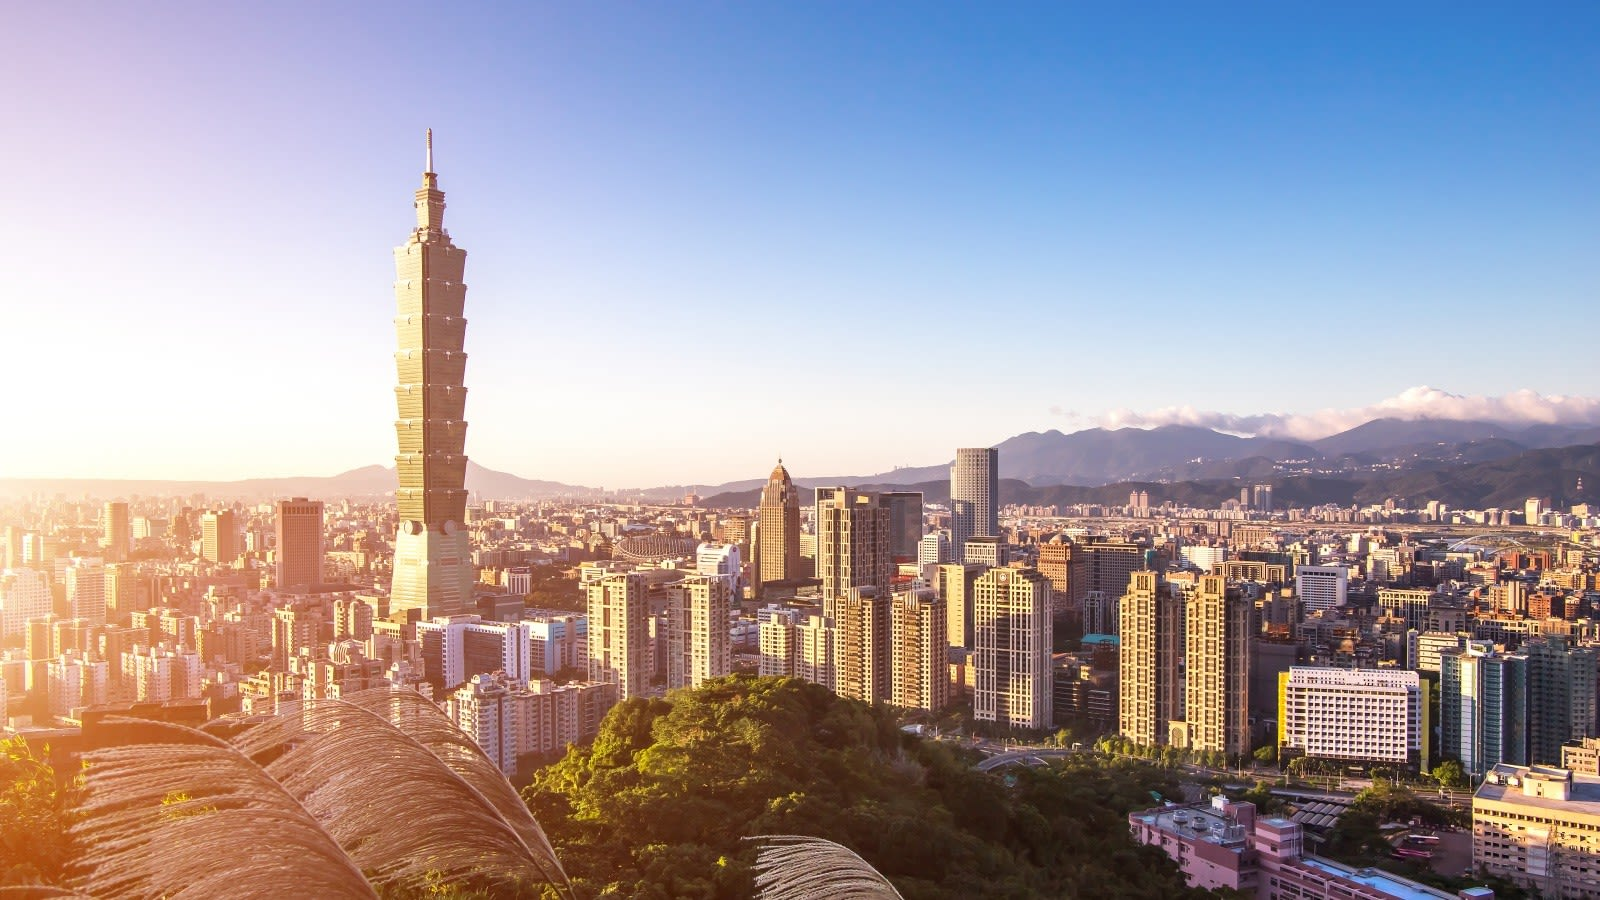 View Taipei 101, one of the world's tallest buildings and Taipei's landmark skyscraper